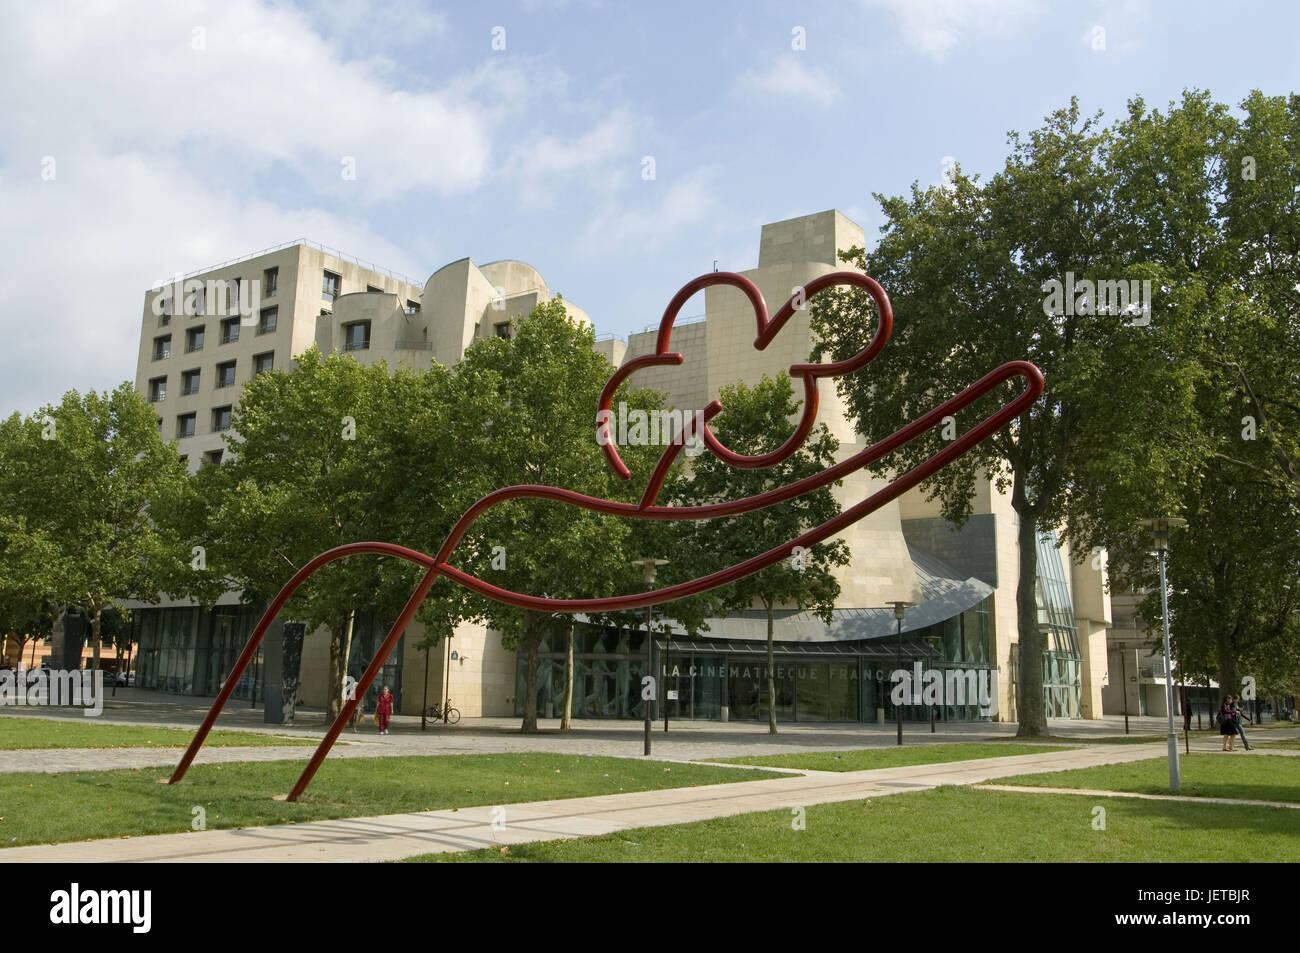 France, Paris, Rue de Bercy, film institute 'Cinematheque of franc As sharp', sculpture, - Stock Image